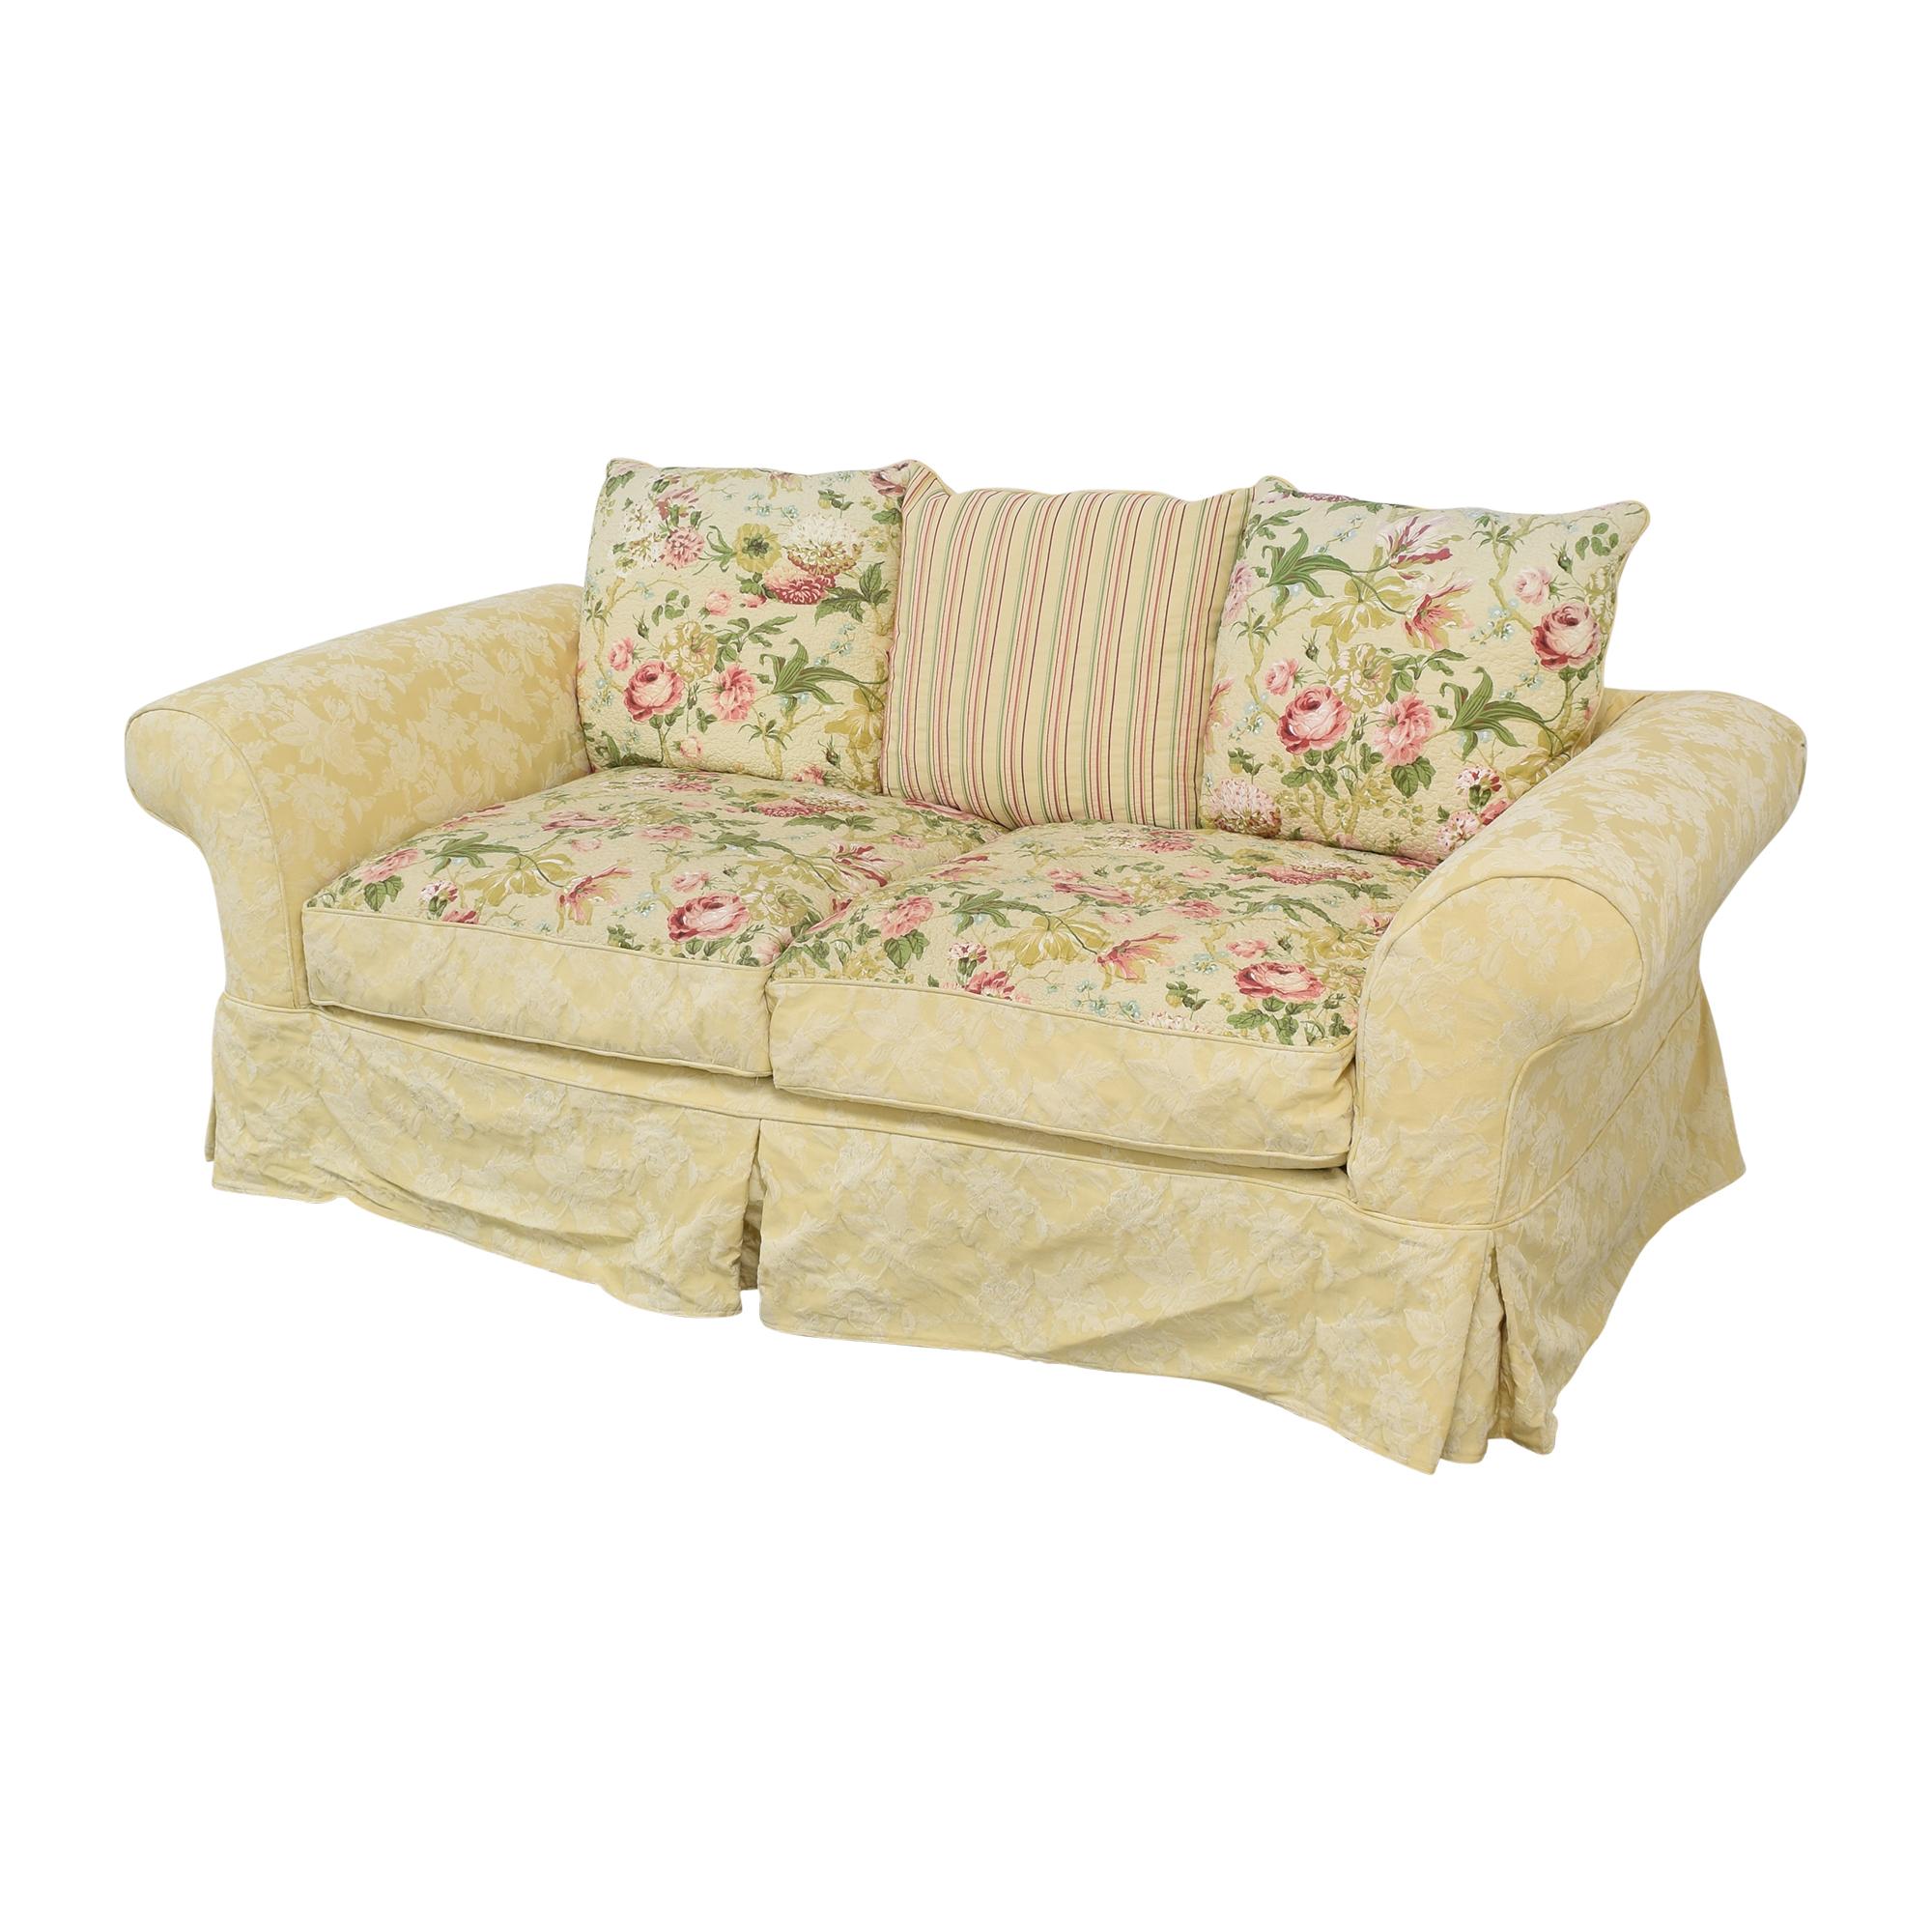 shop Domain Domain Multi-Patterned Sofa online